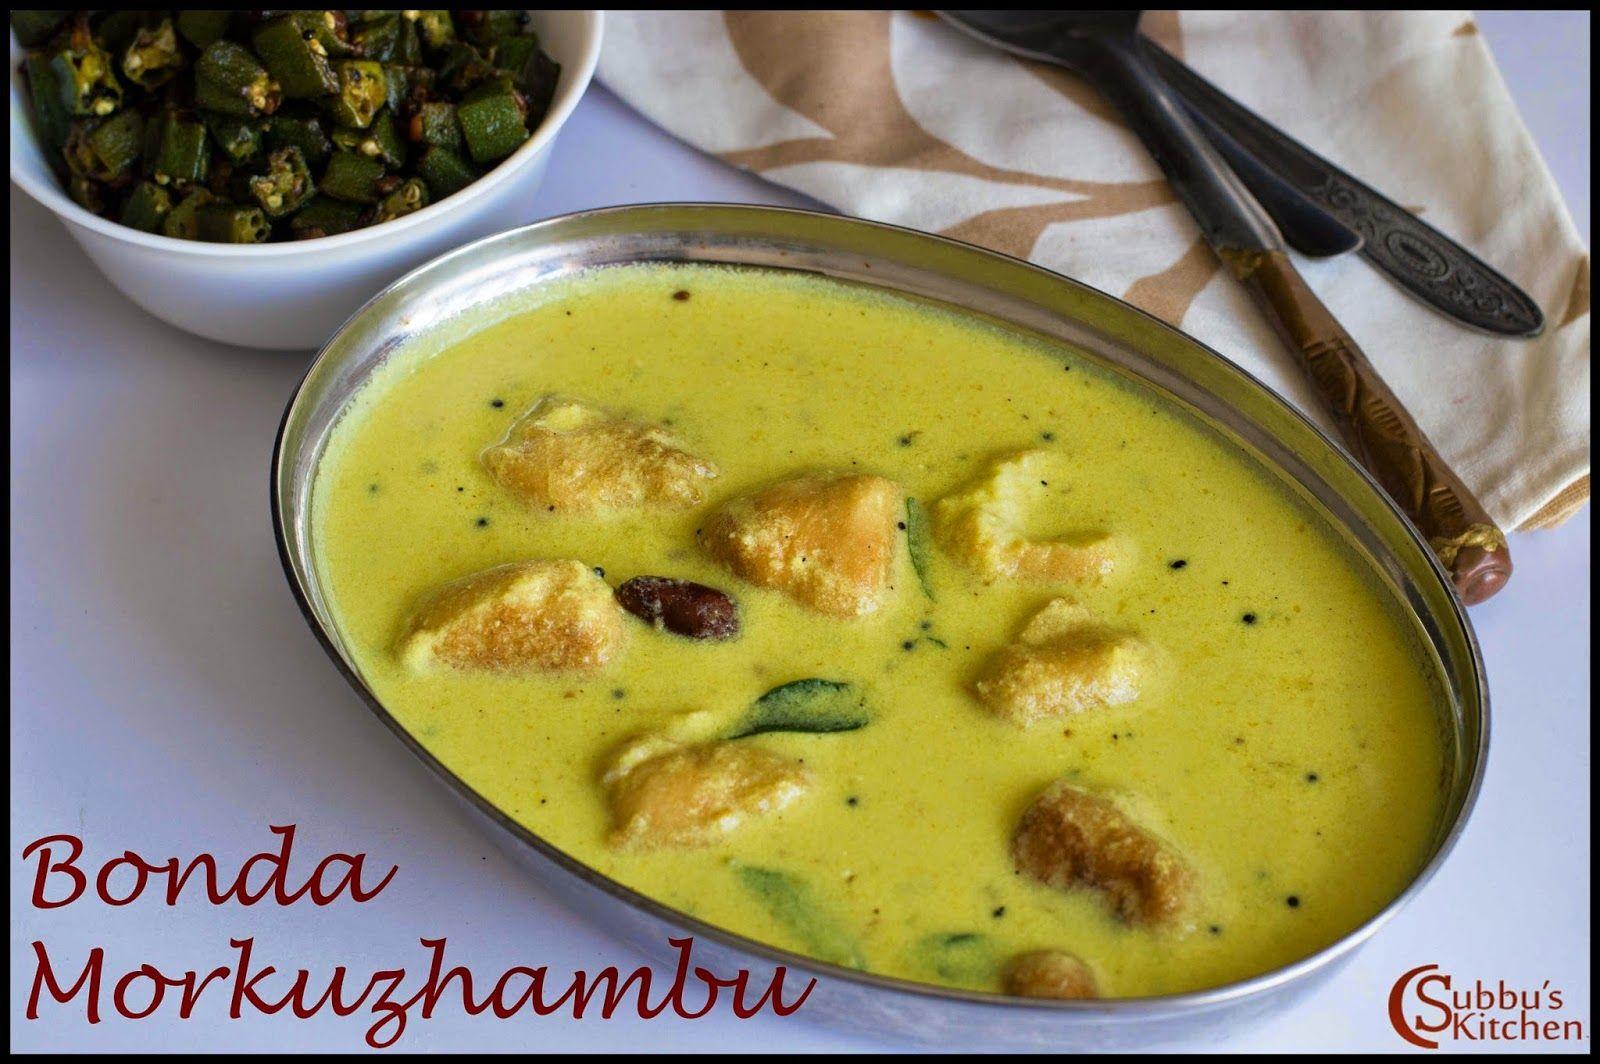 South Indian Lunch Menu 20 Bonda Morkuzhambu Drumstick Rasam Ladysfinger Fry Papad And Plain Rice Recipes Indian Food Recipes Sevai Recipe